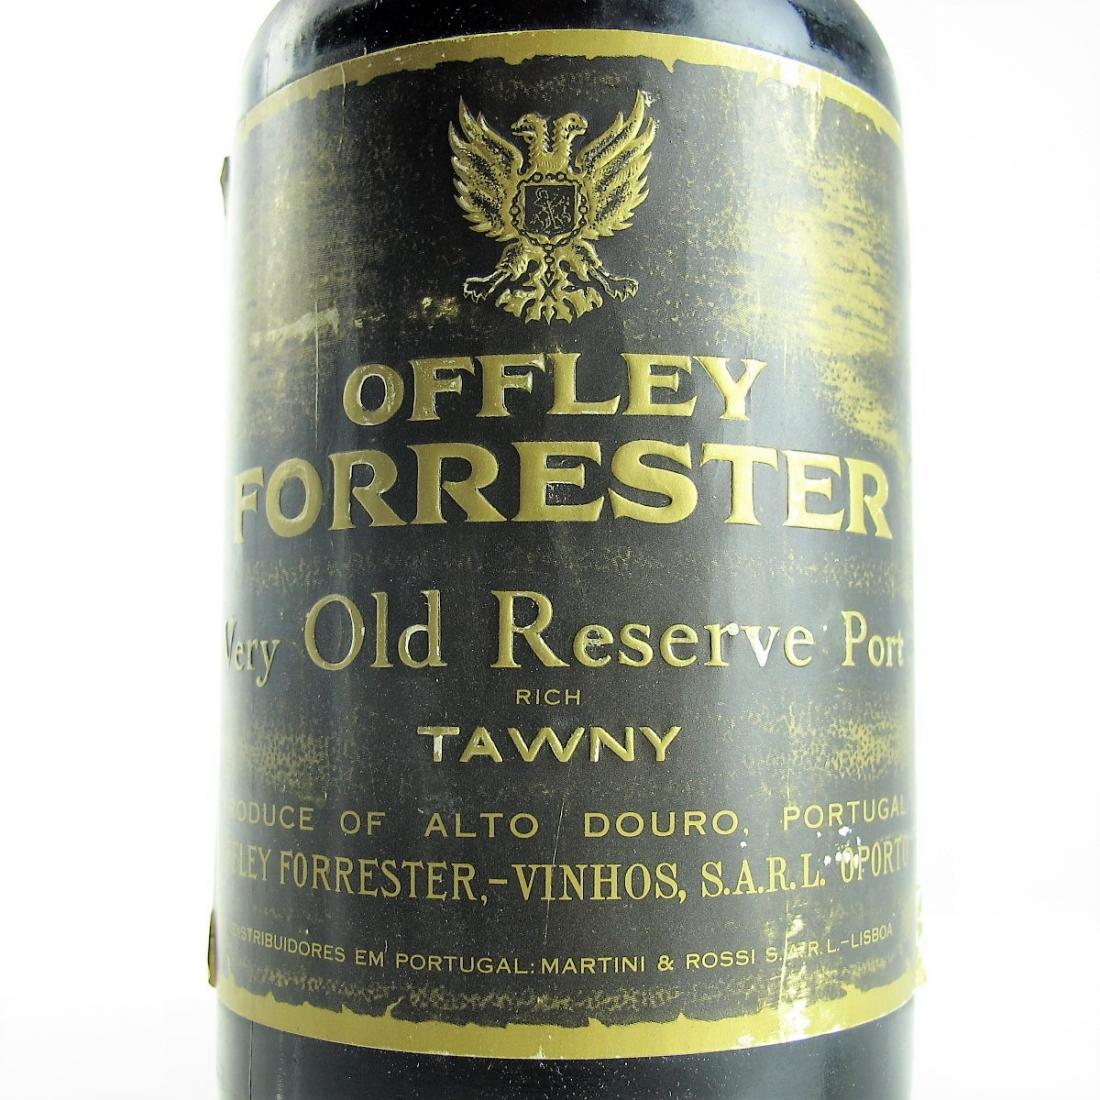 Offley Forrester Tawny Port